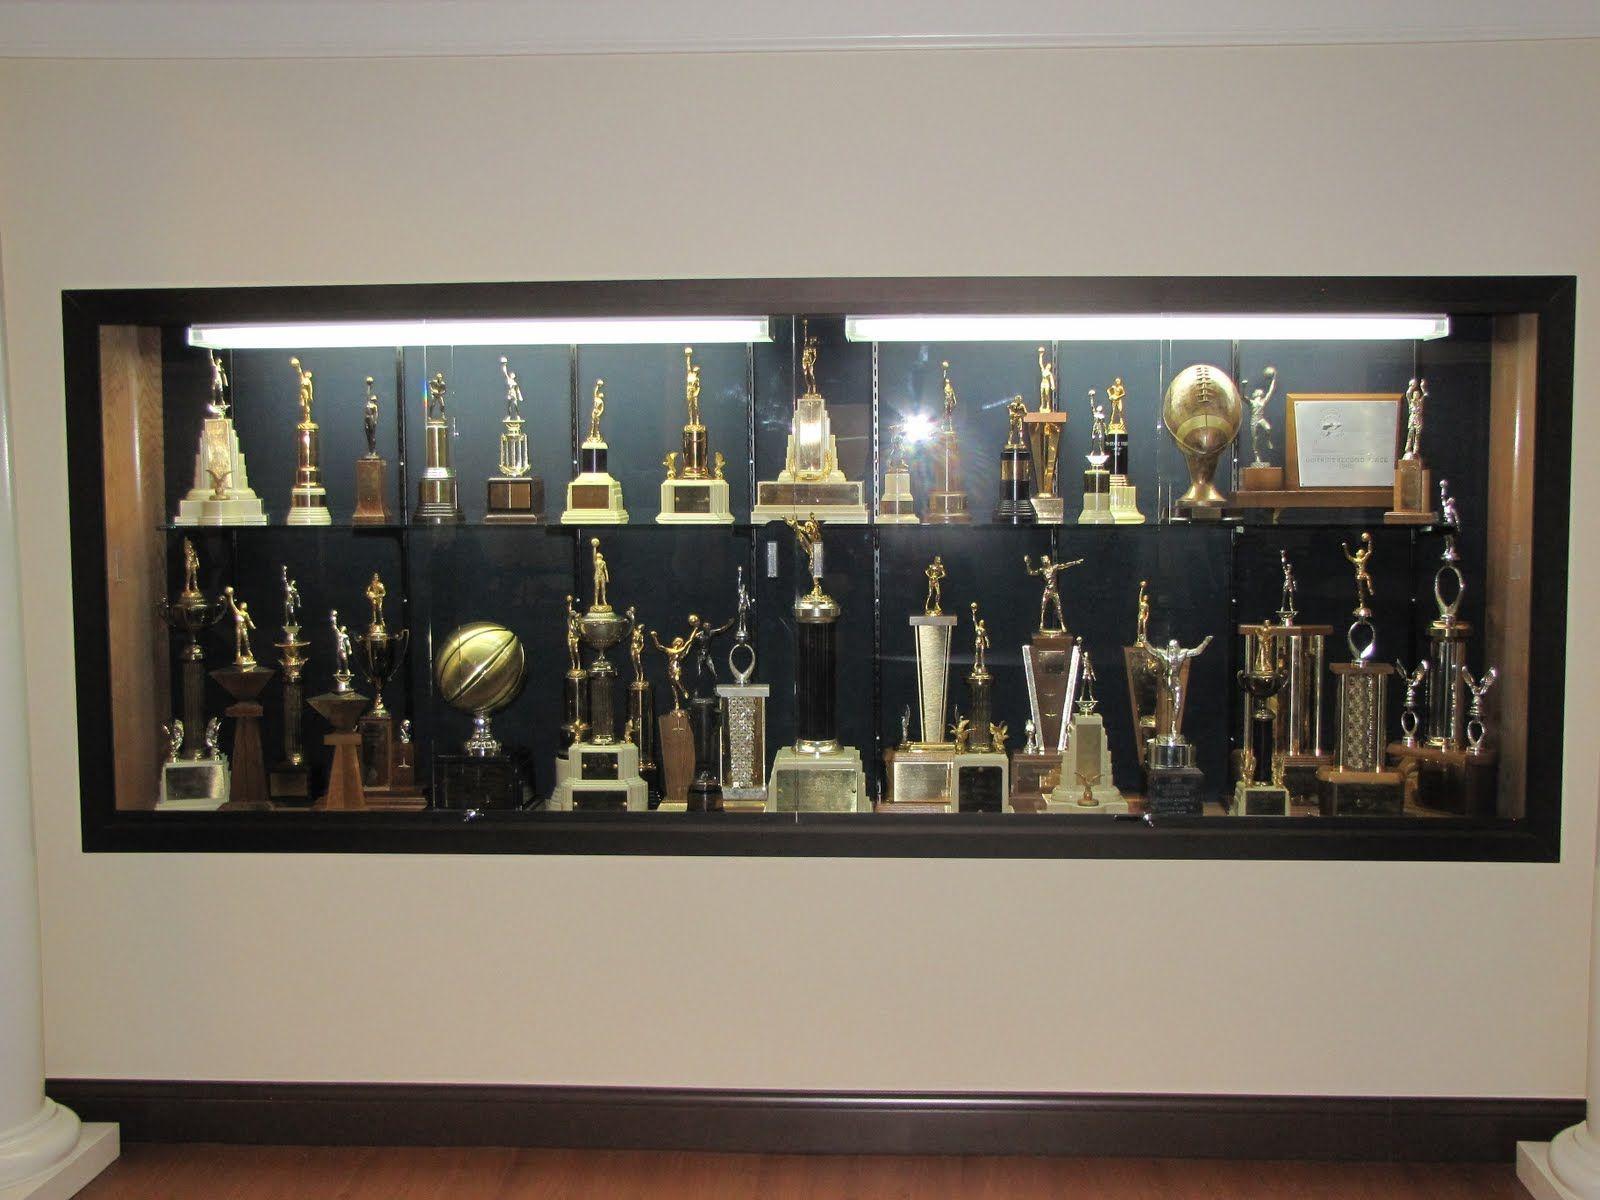 Google chrome themes crvena zvezda - High School Trophy Case Google Search